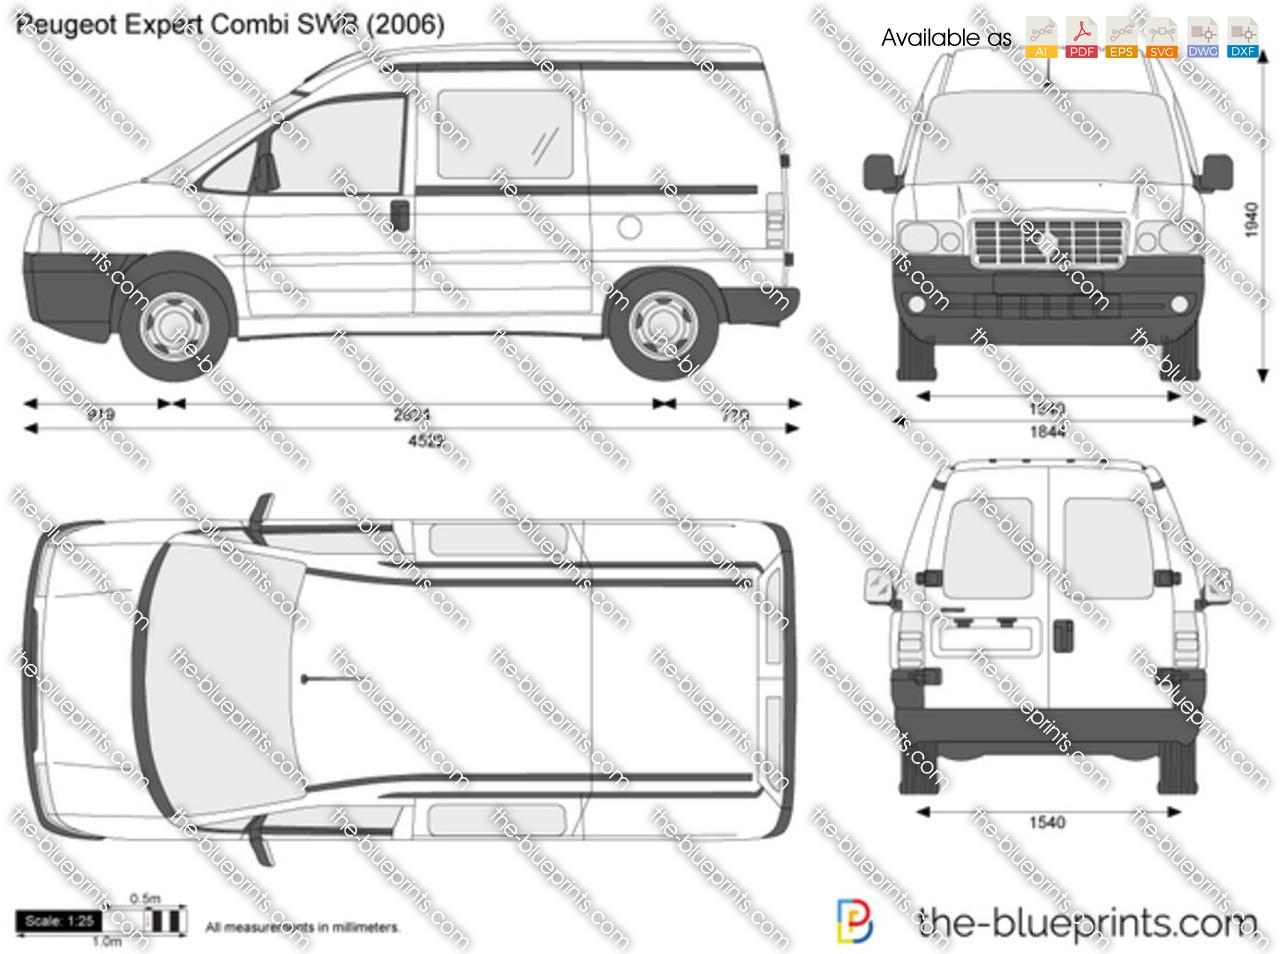 Peugeot Expert Combi SWB